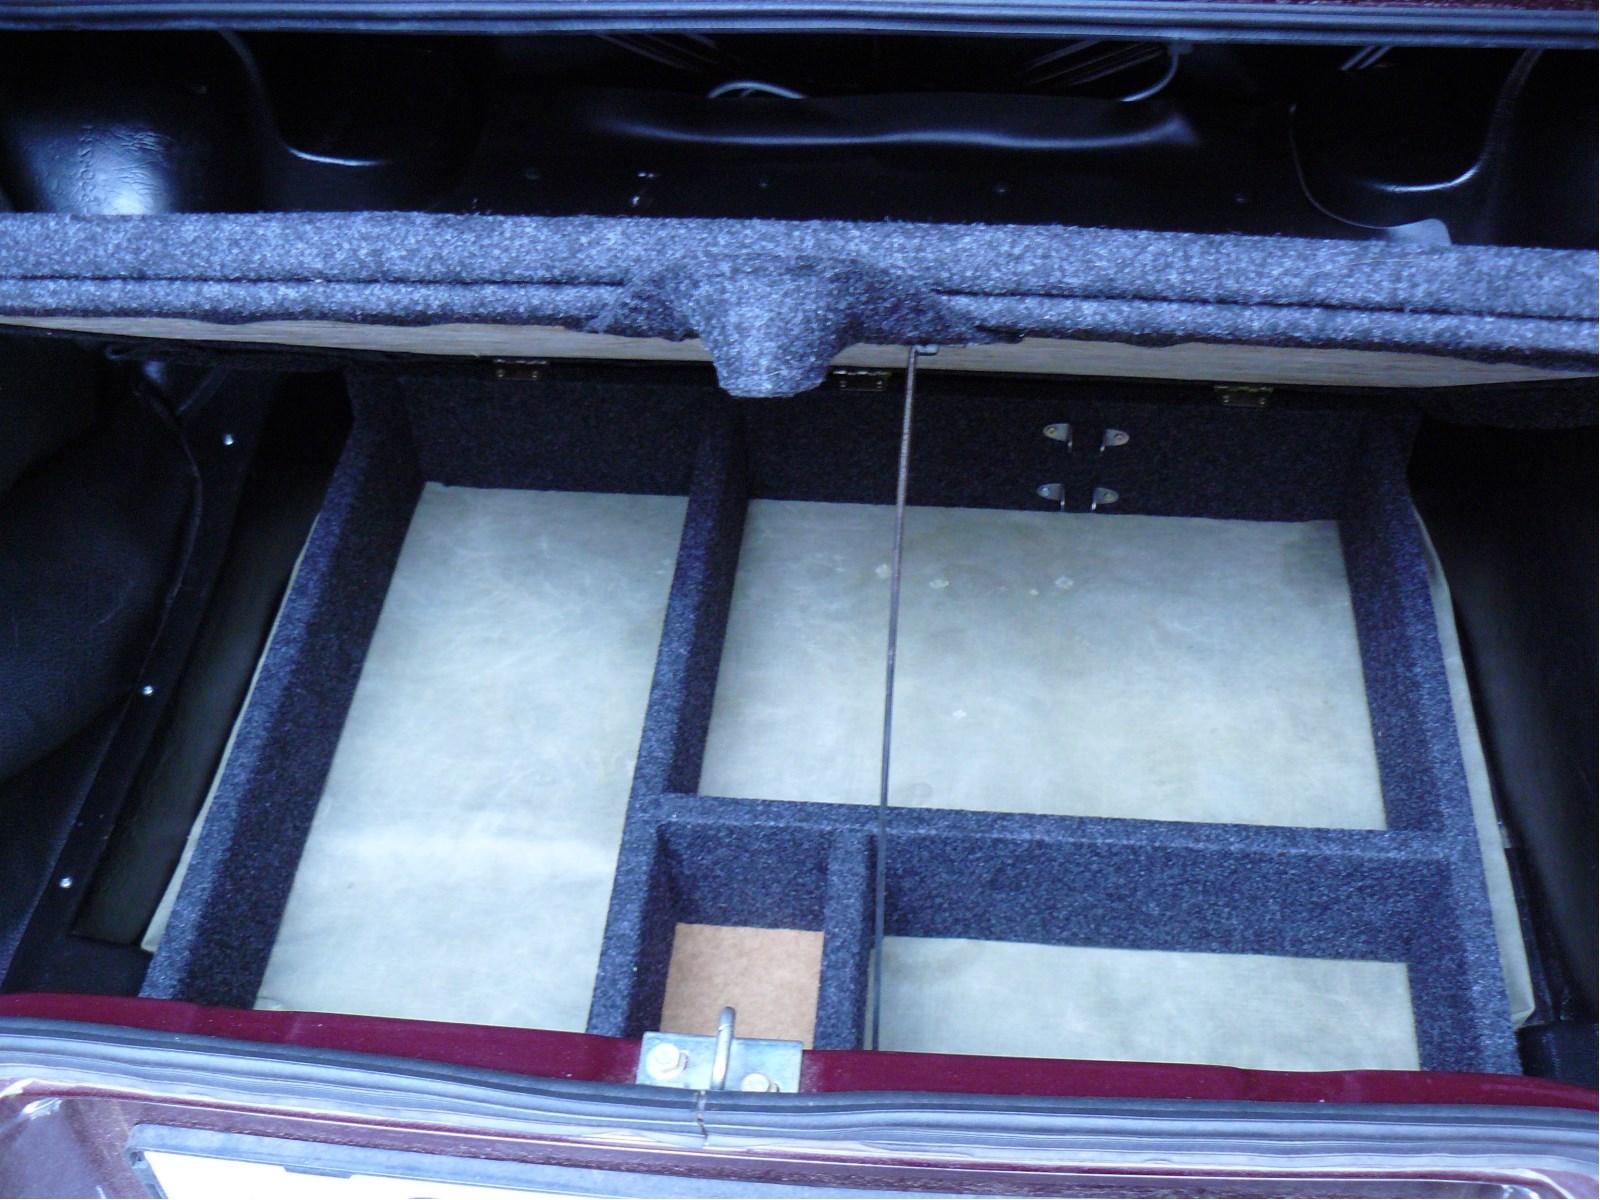 Фальшпол в багажник ваз 2114 своими руками 98